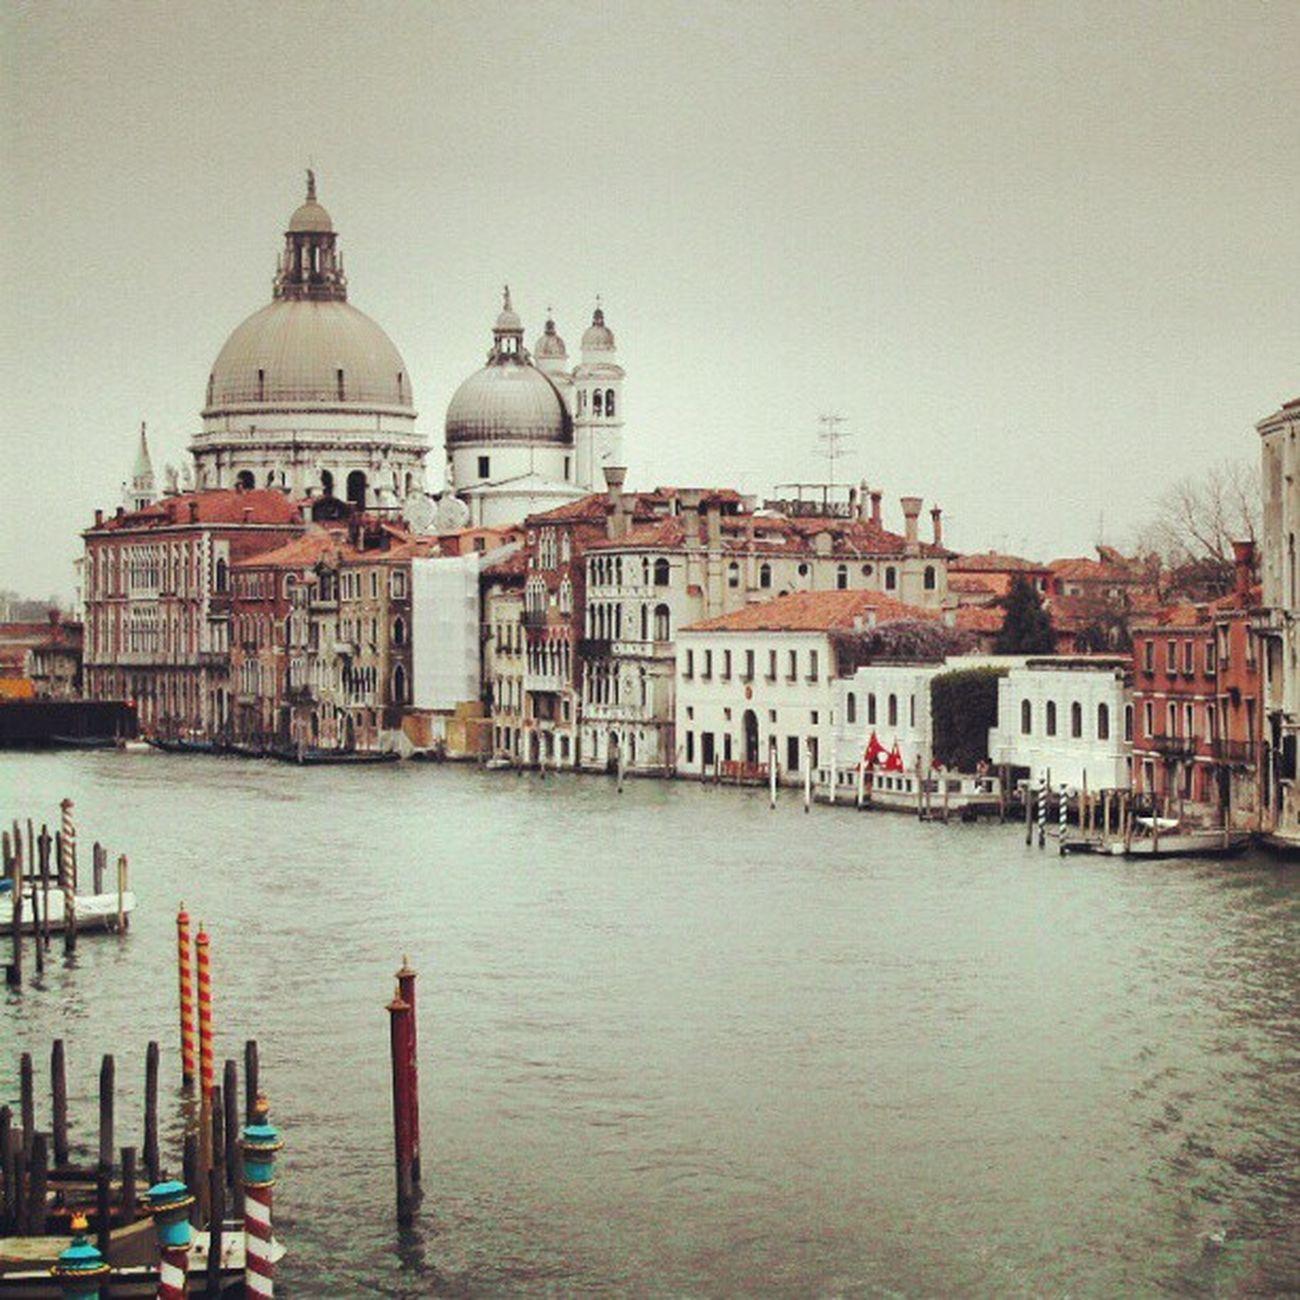 #venice #house #water #igers #igfamos #instagood Water Venice House Igers Instagood Igfamos